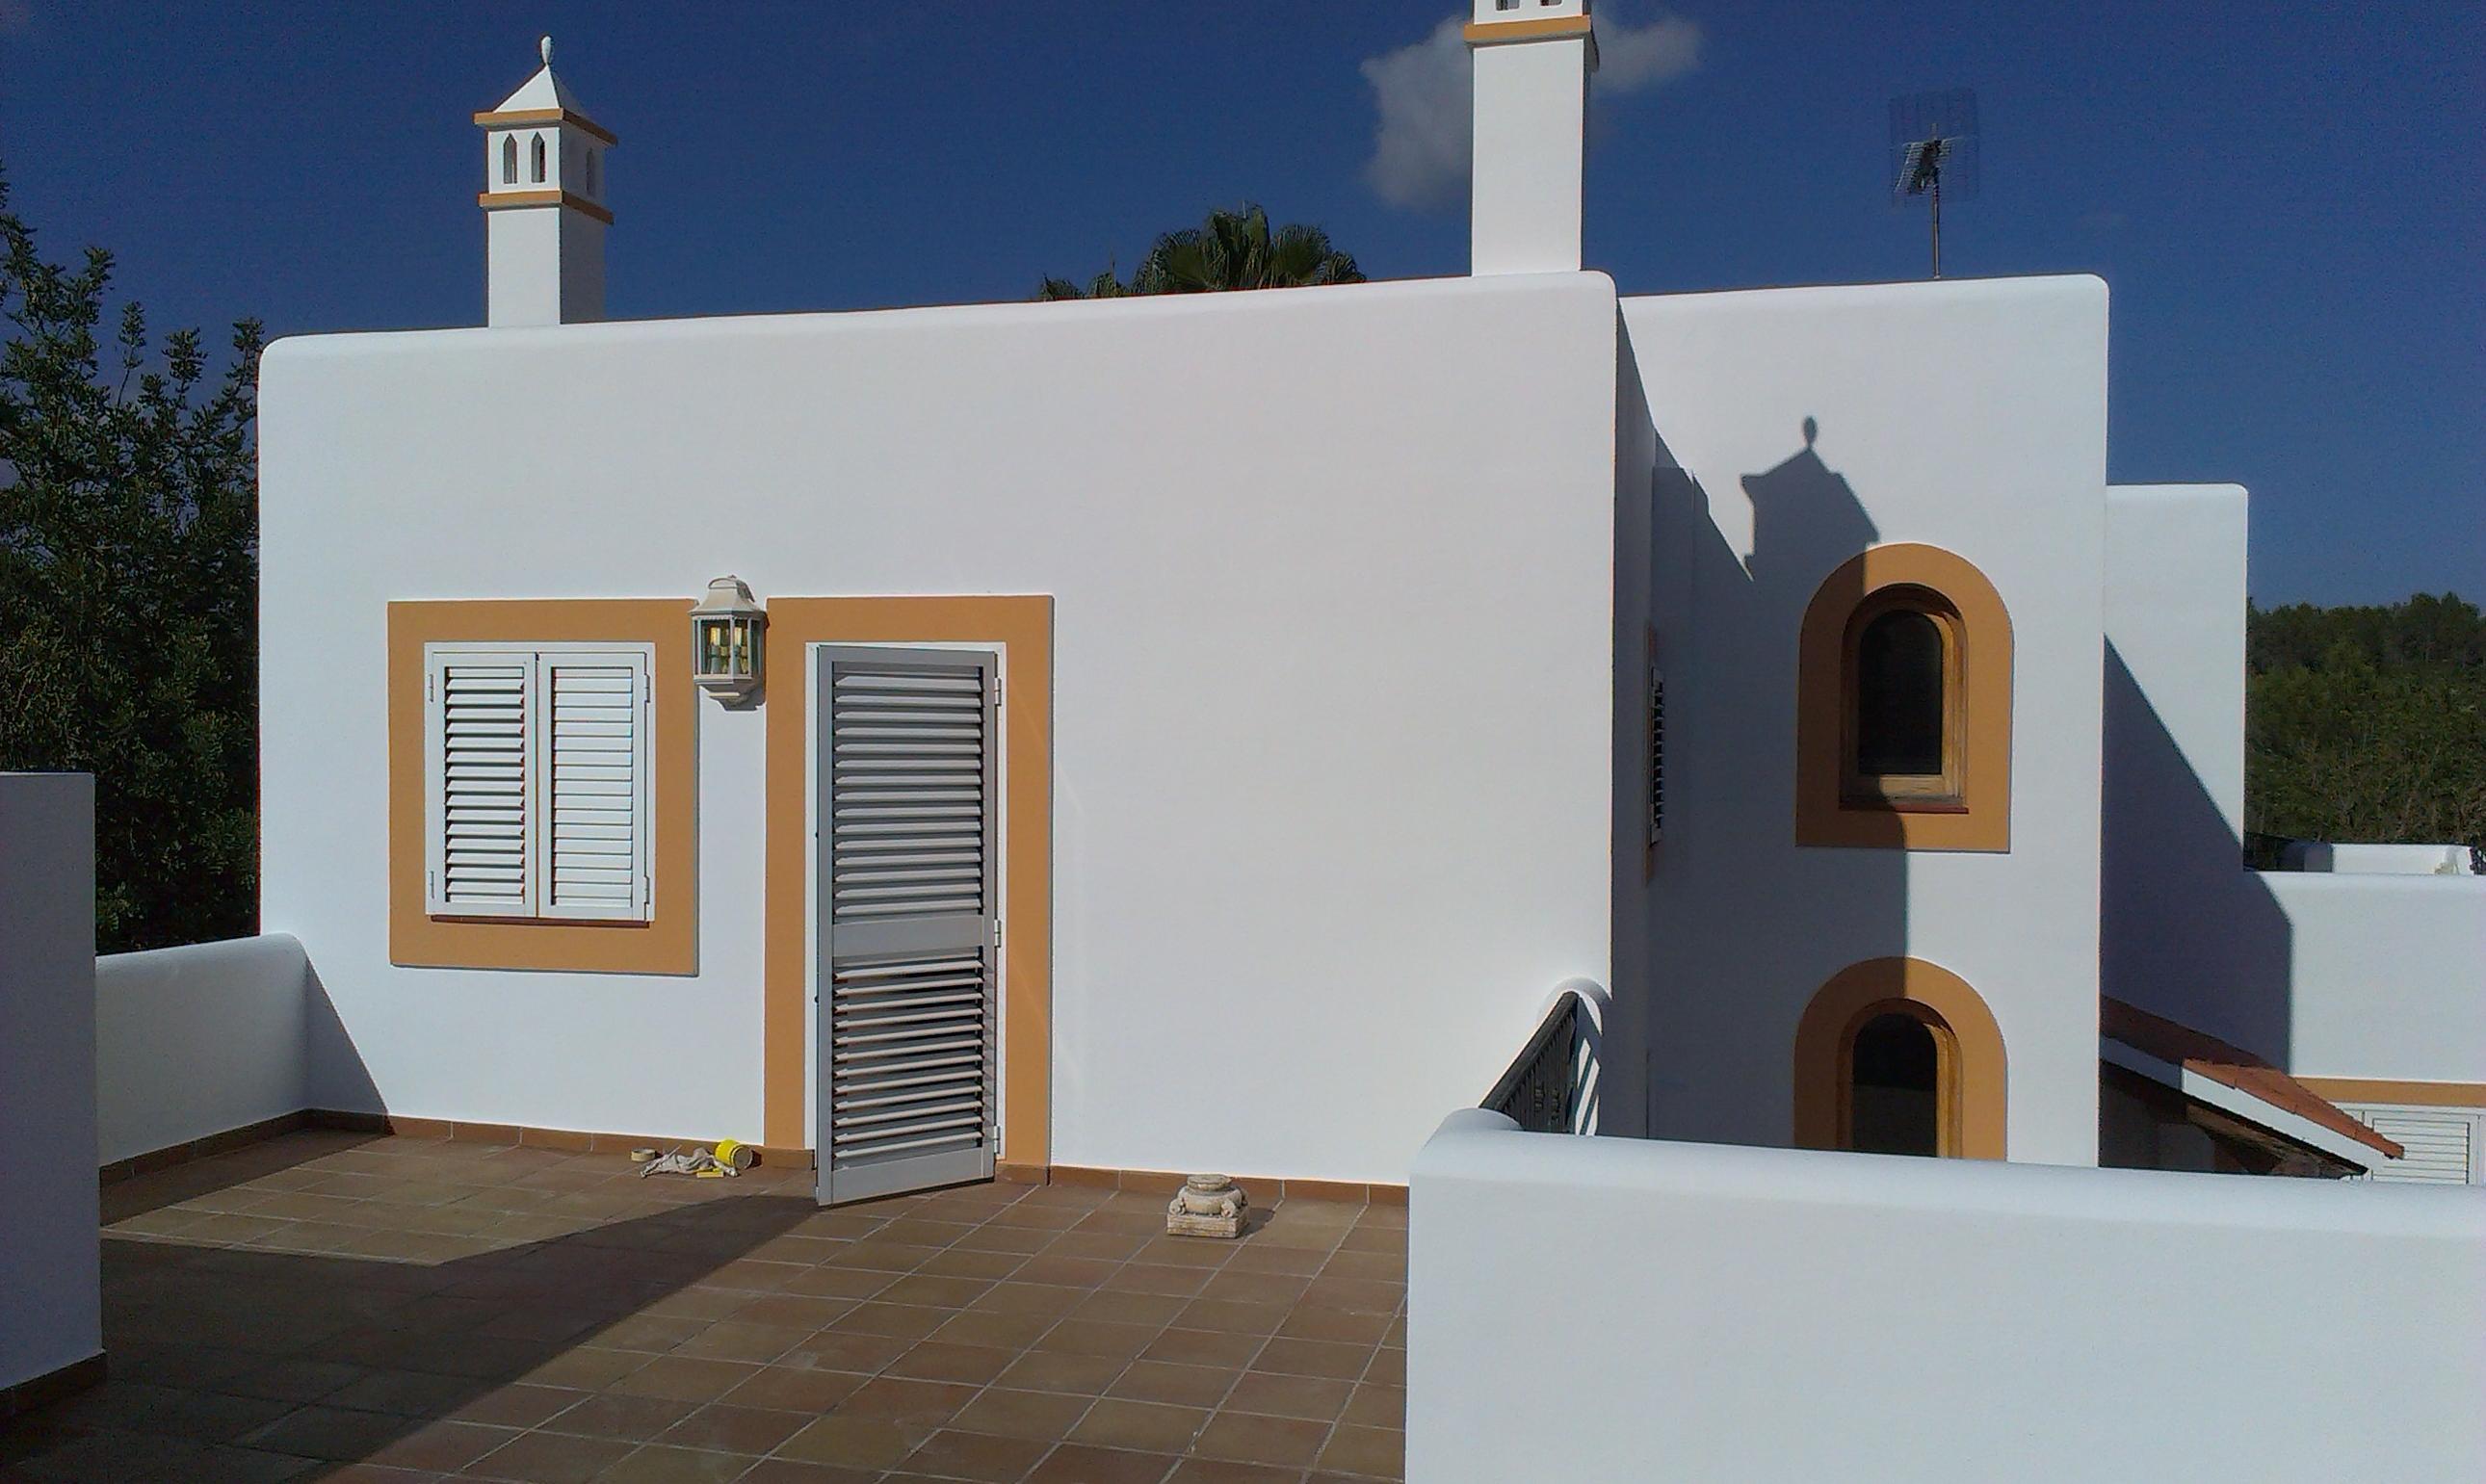 Rehabilitación de chalet  en Santa Gertrudis. Saneado de fachada con agua a presión, lucido rustico y pintura a dos colores.